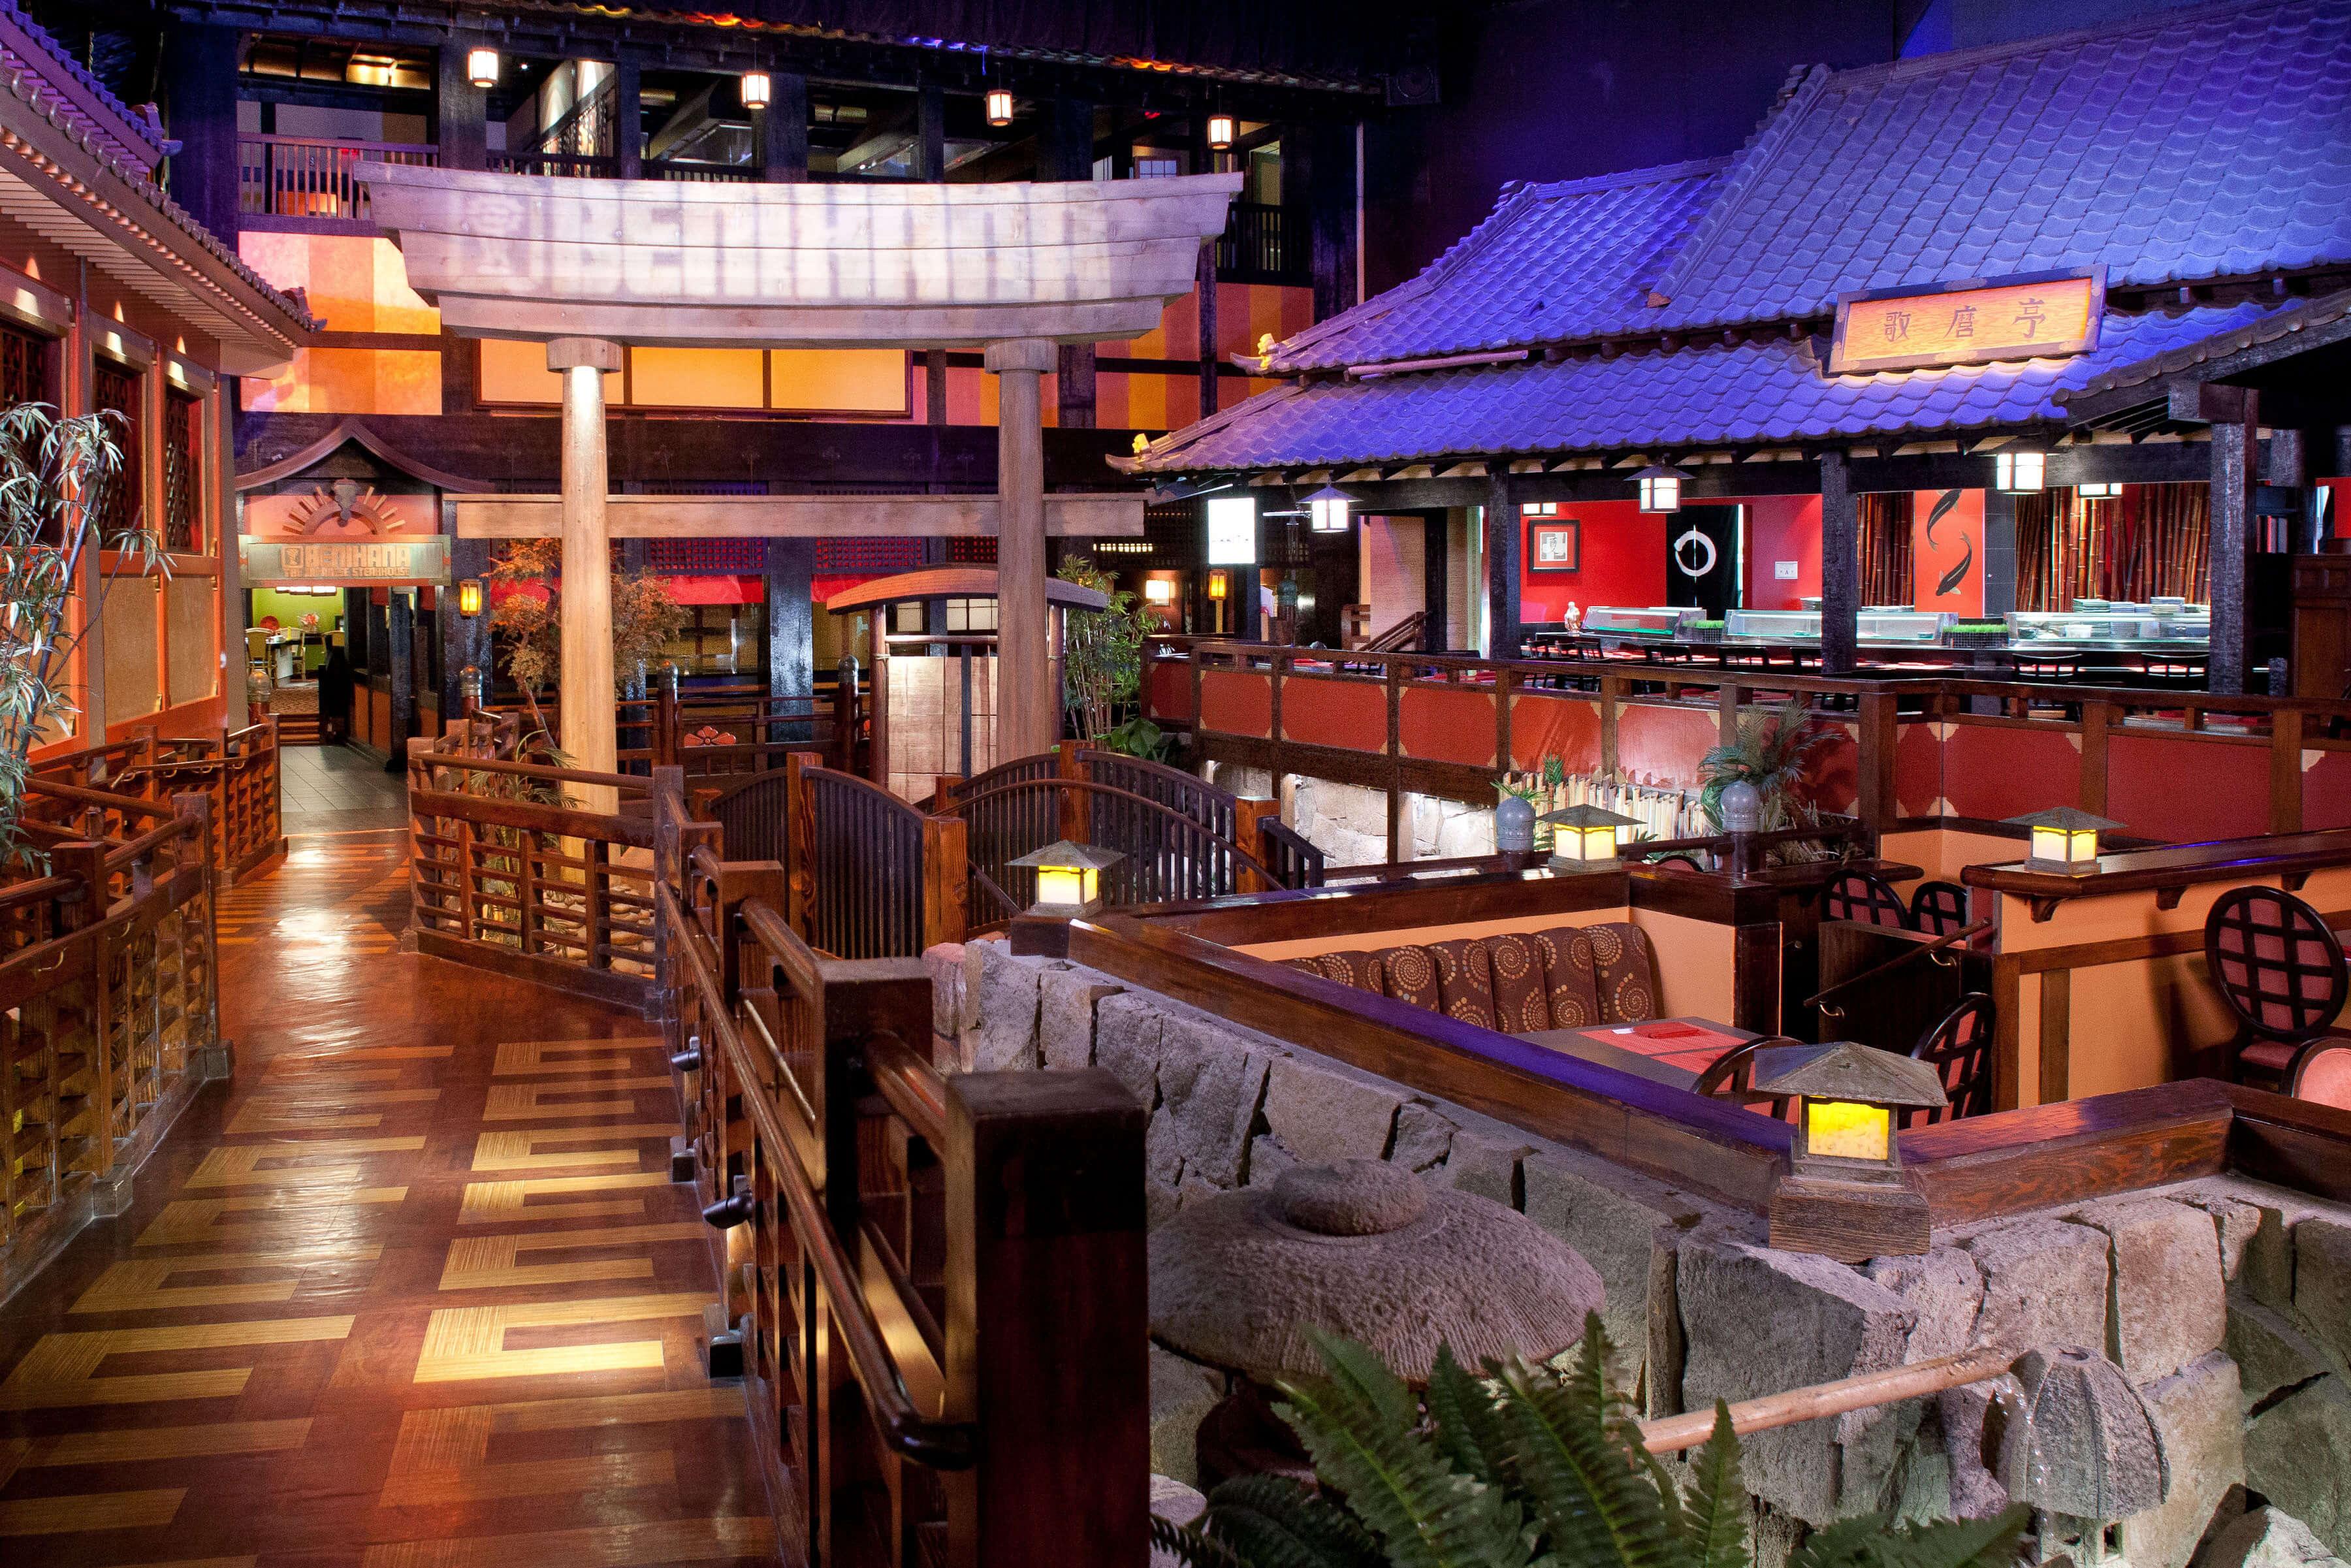 Interior of Benihana Las Vegas NV | Benihana hibachi in Las Vegas is world famous | Westgate Resorts